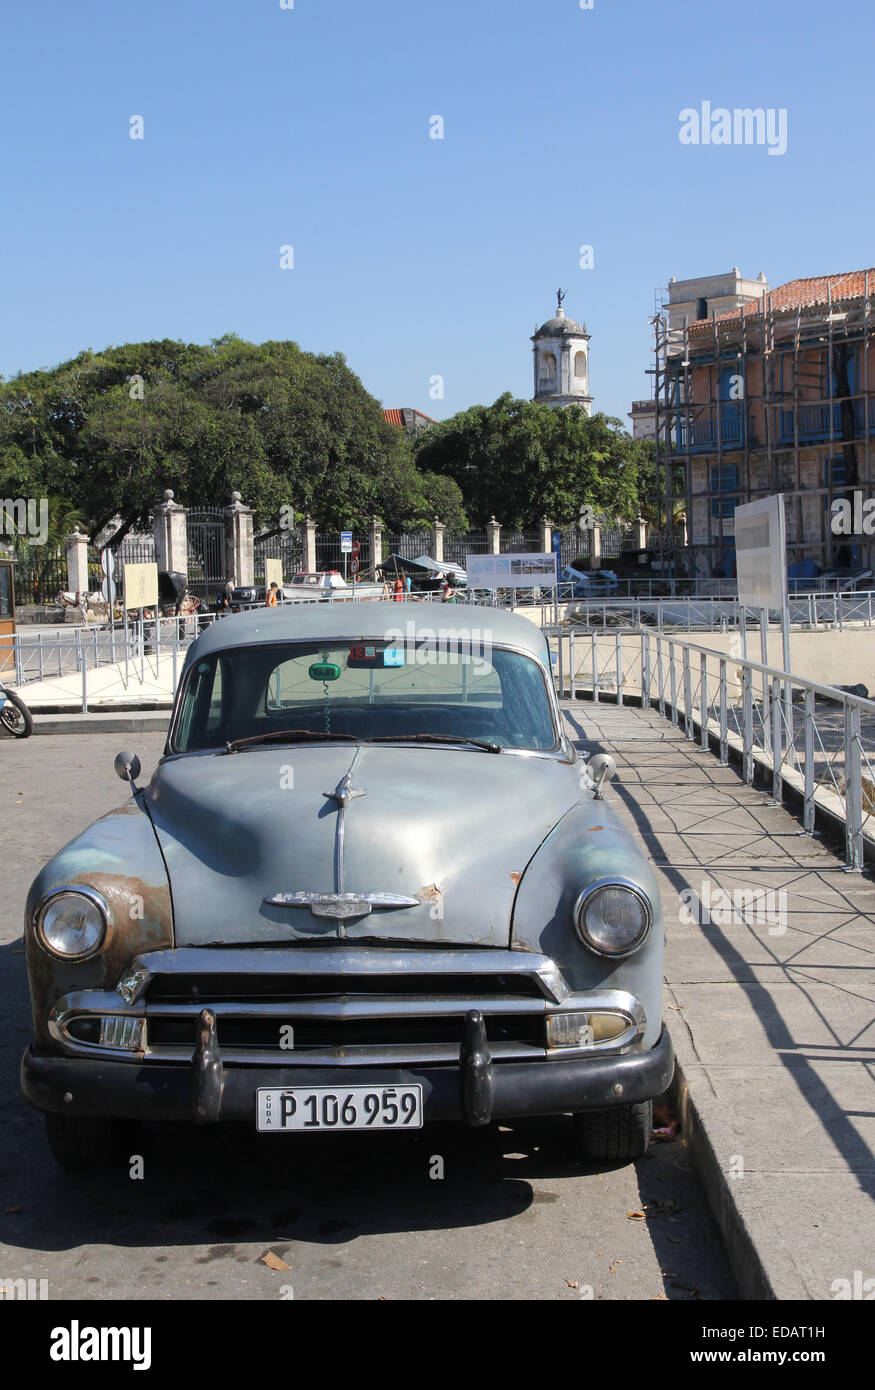 Old Car Havana Cuba - Stock Image